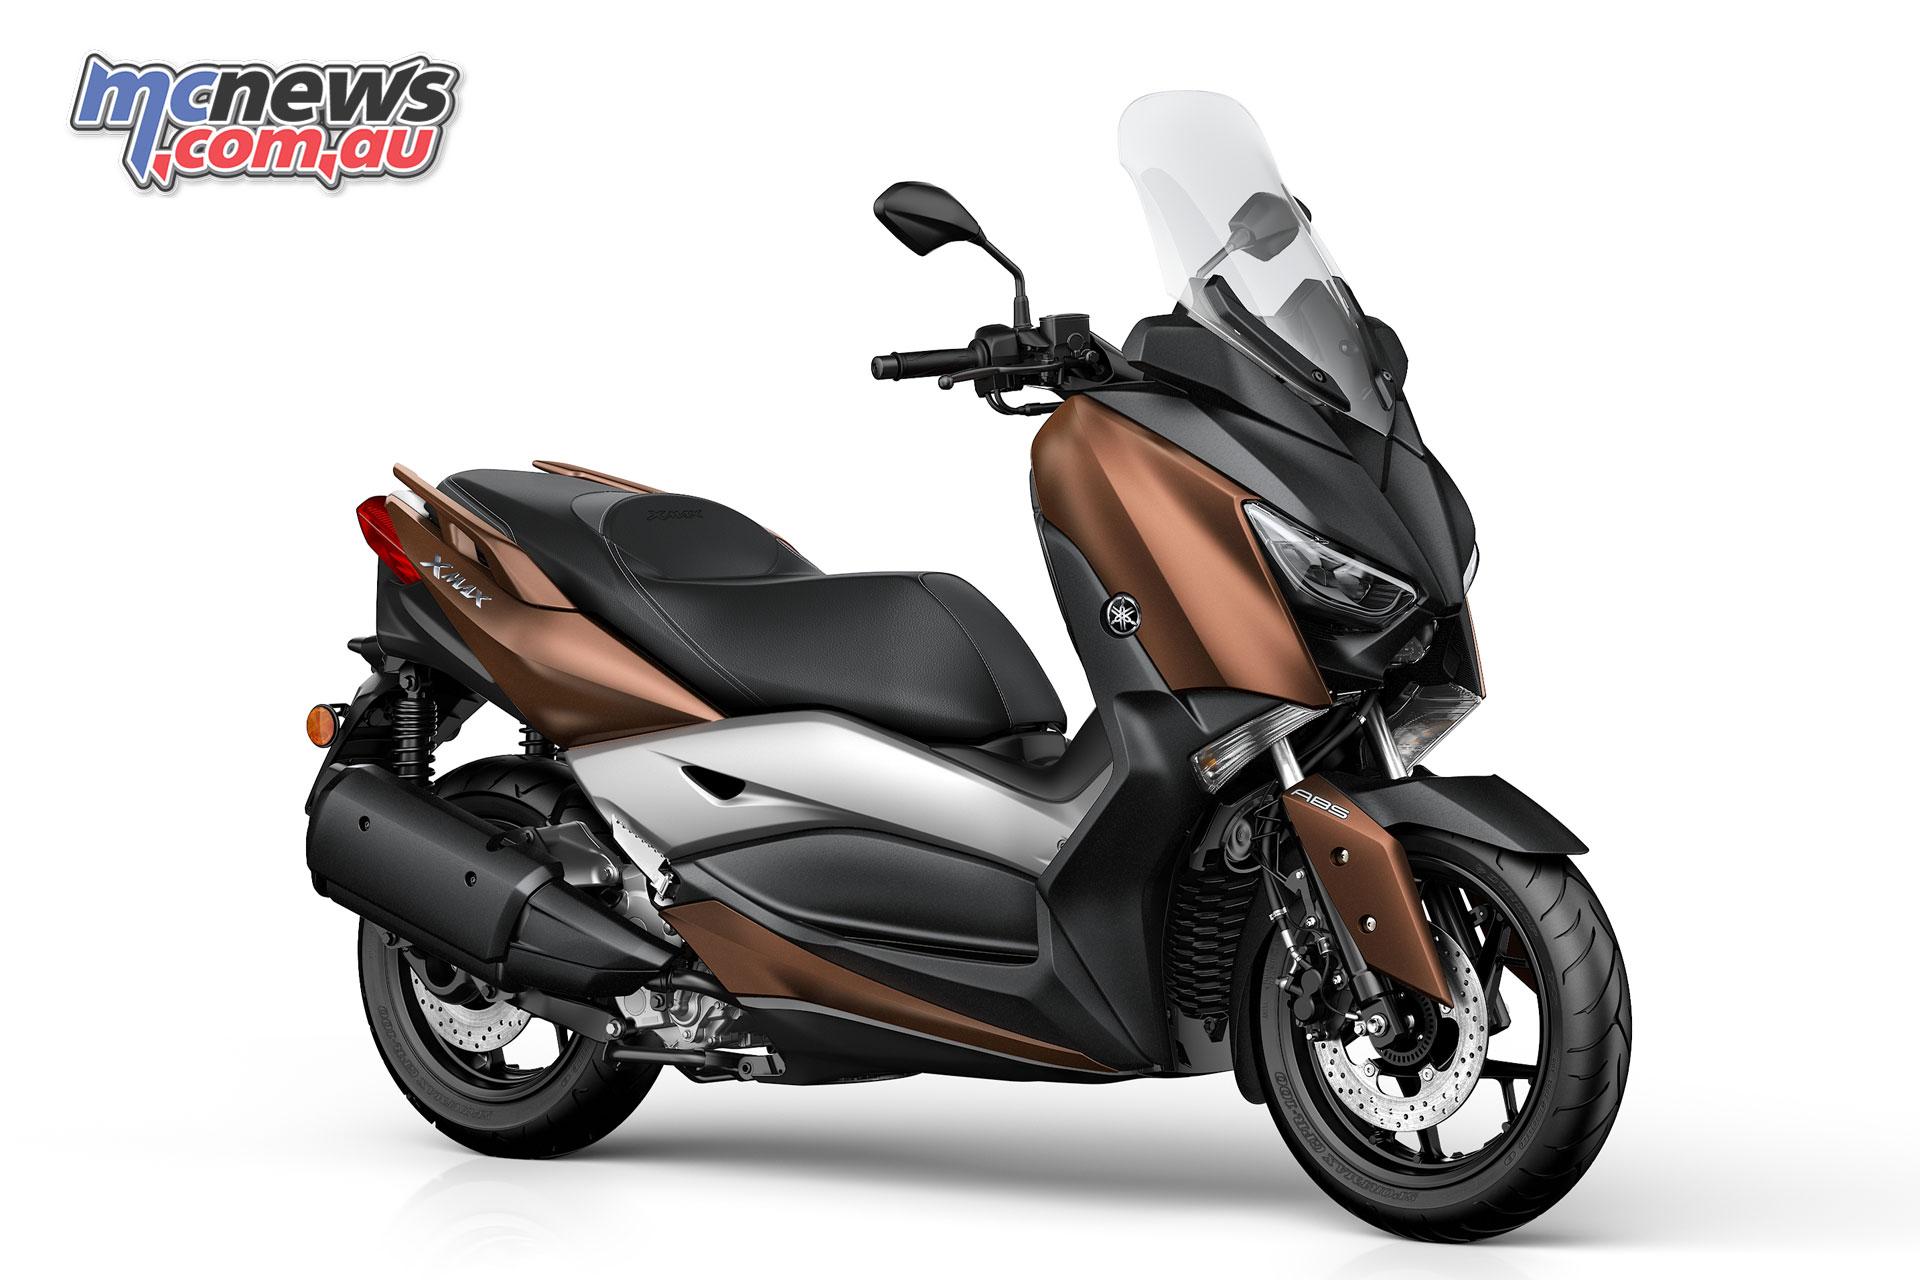 2010 yamaha tmax motorcycle service manual